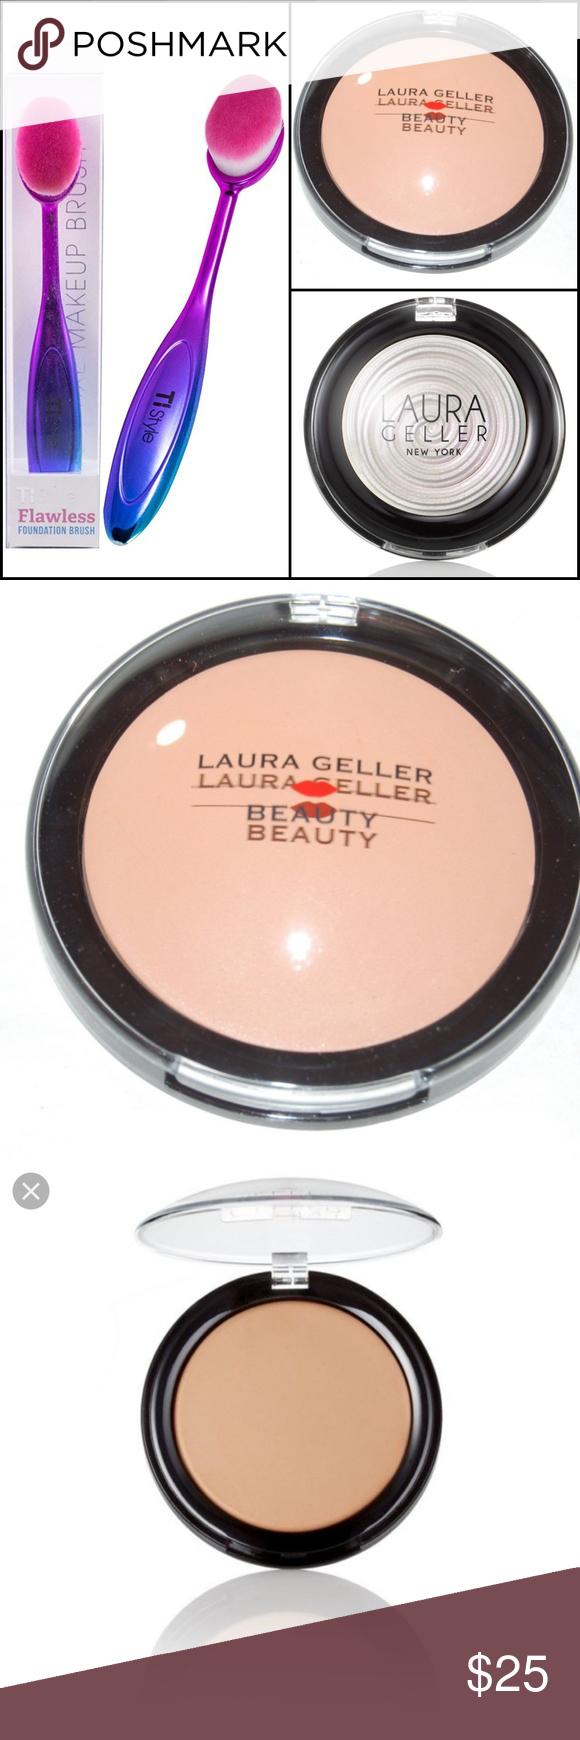 Laura Geller Makeup Set Laura Geller Makeup Laura Geller Makeup Set